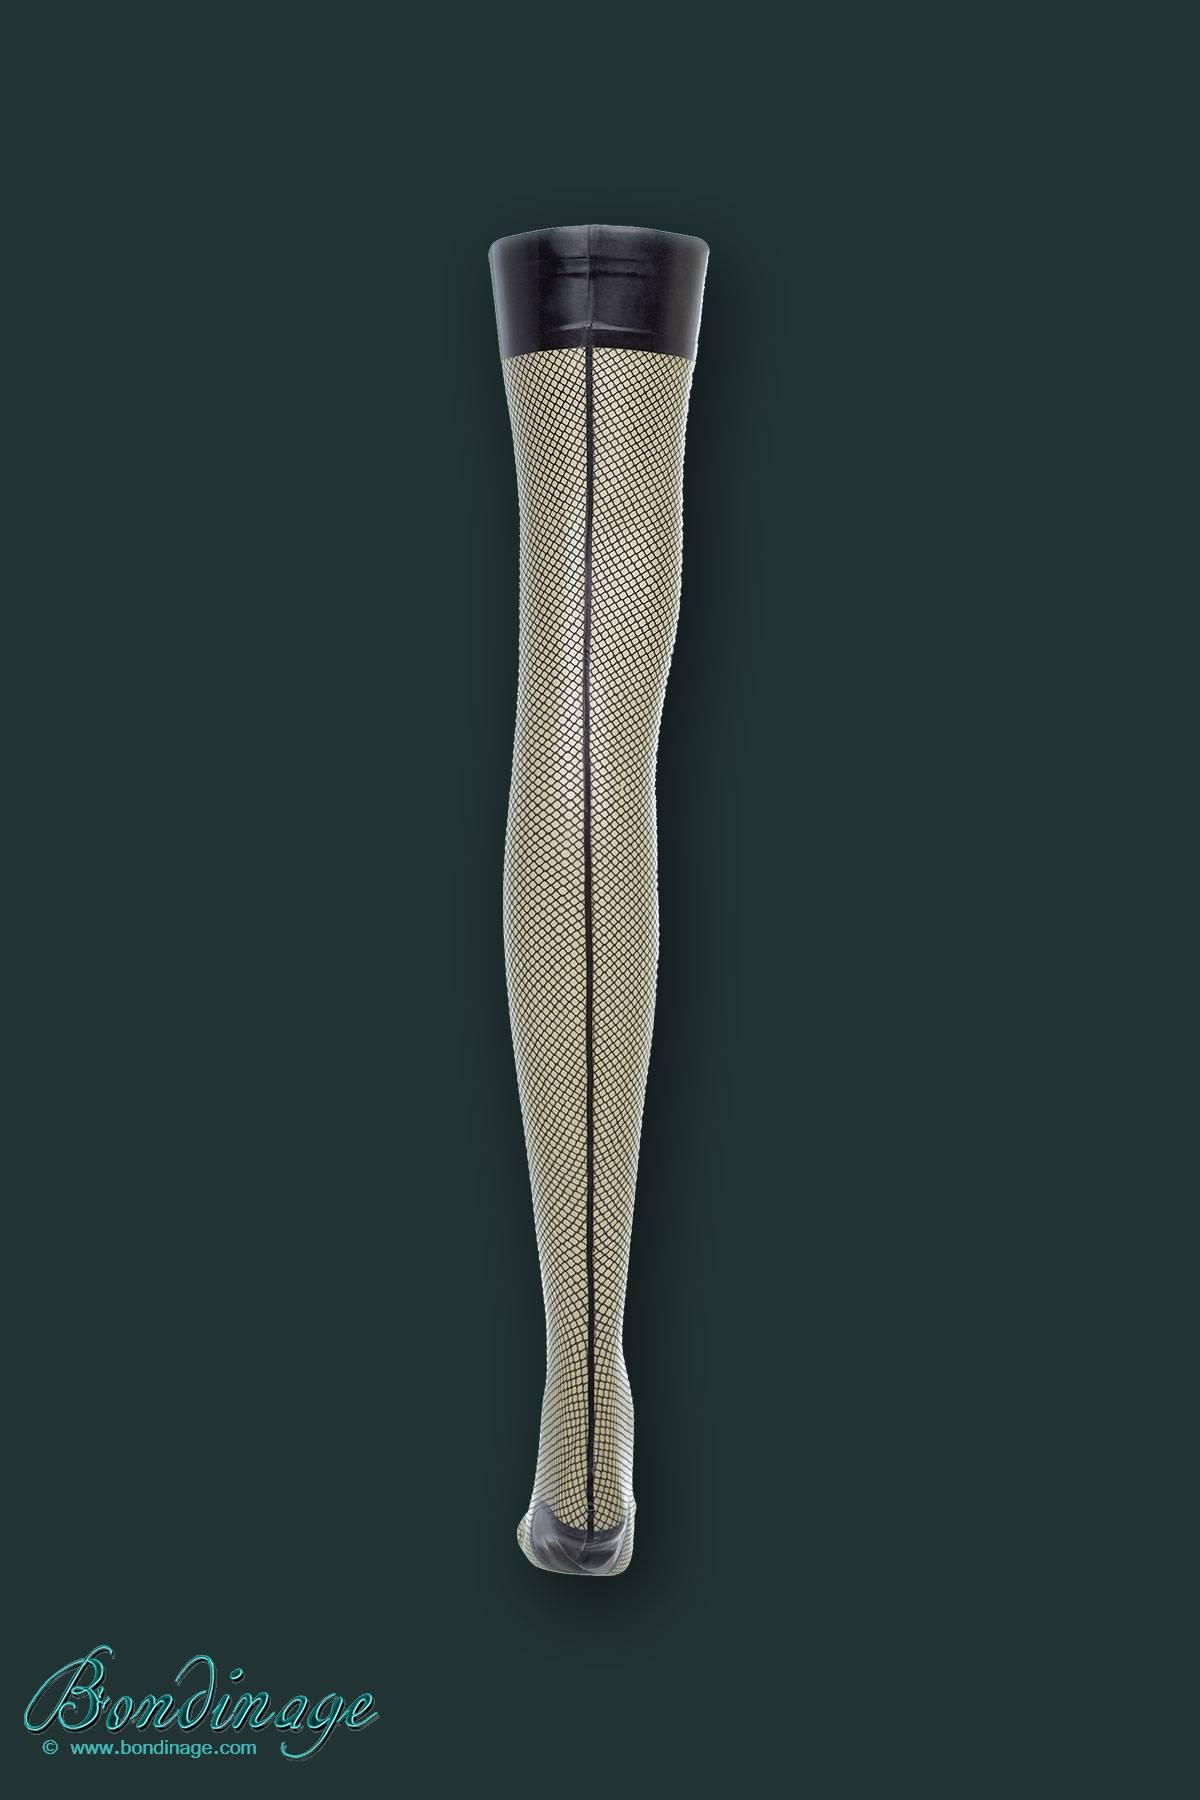 Fishnet Print Latex Stockings Bondinage Fetish Fashion